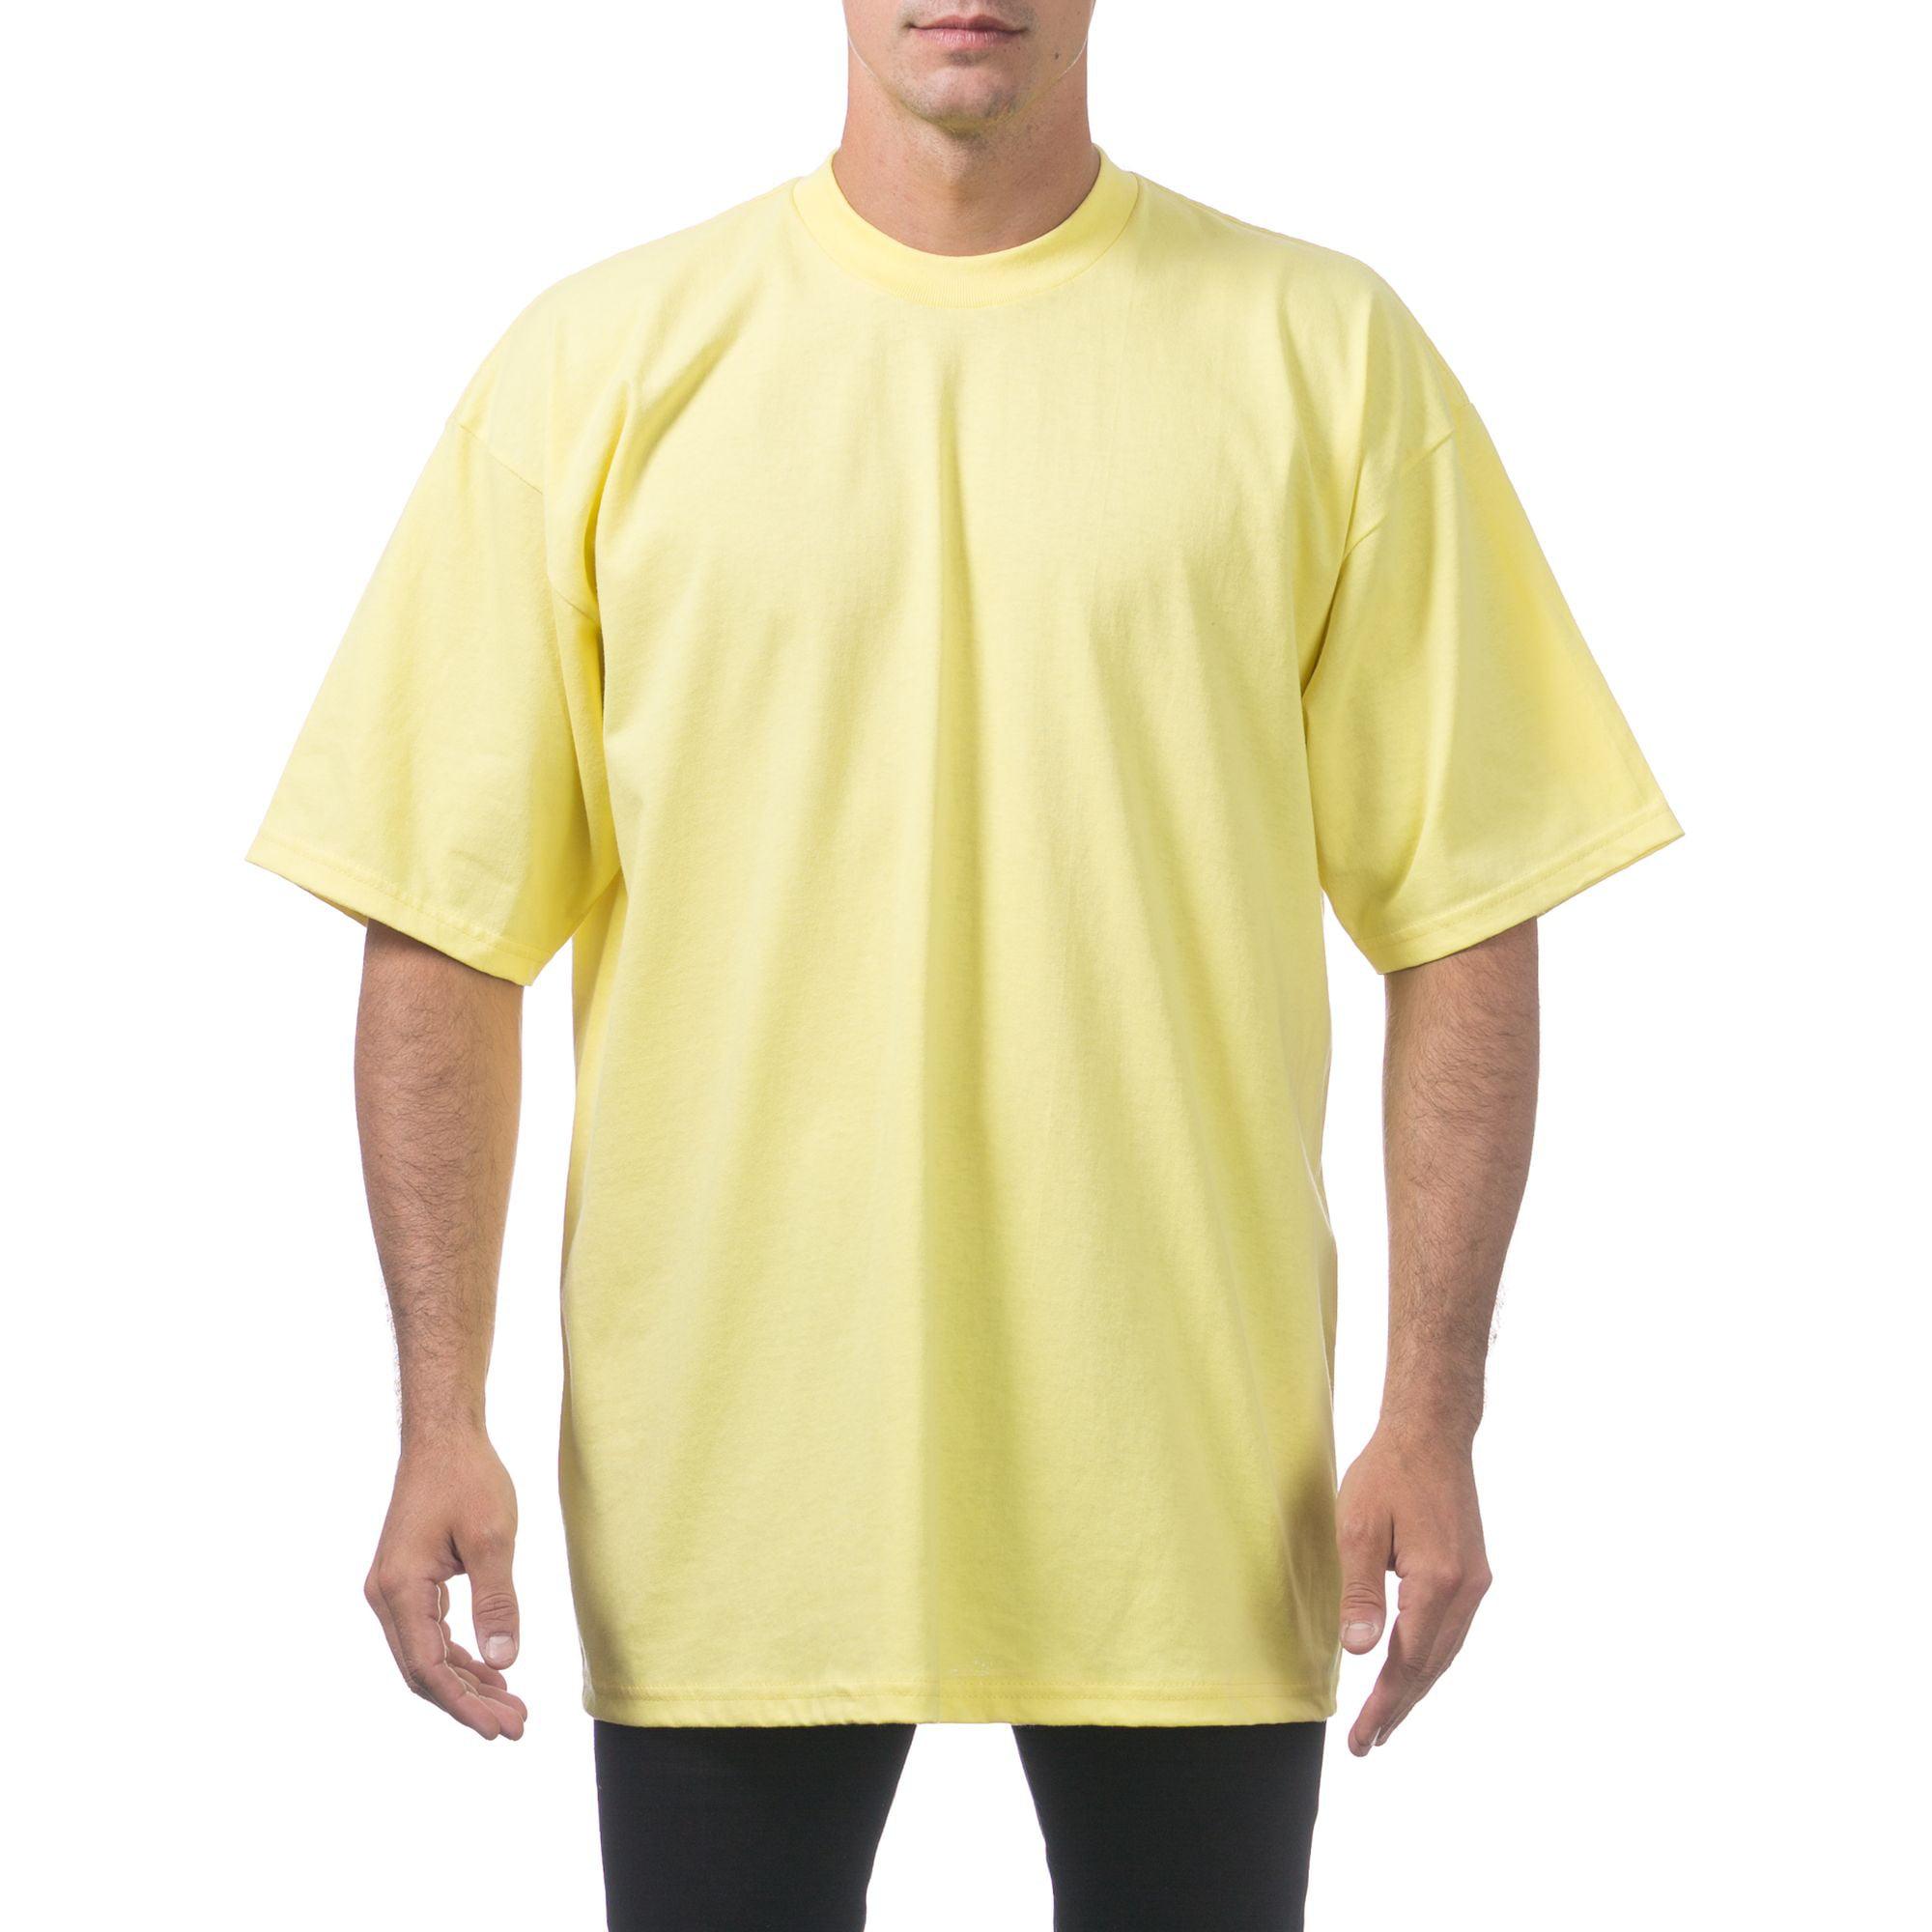 PROCLUB MEN/'S T-SHIRT PRO CLUB T-SHIRT HEAVY WEIGHT LONG SLEEVE TEE CREW NECK